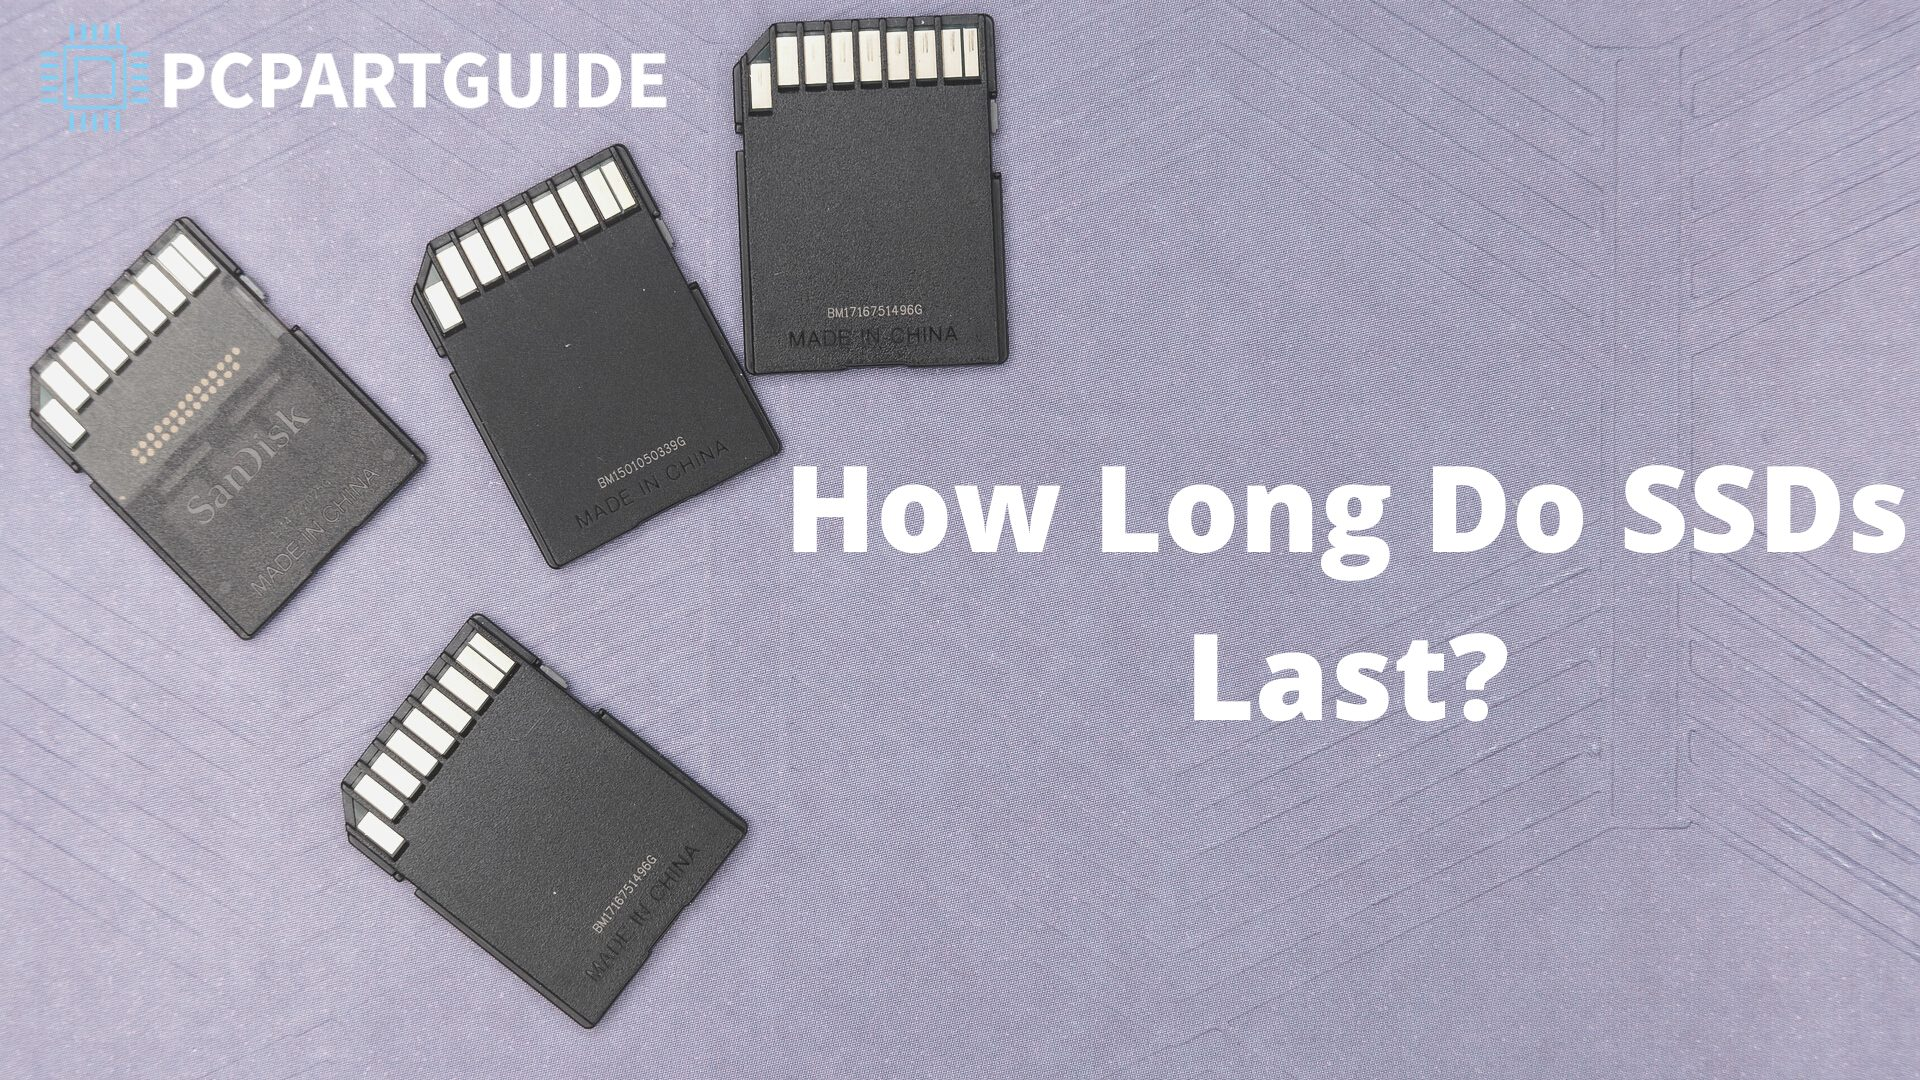 how long do ssds last